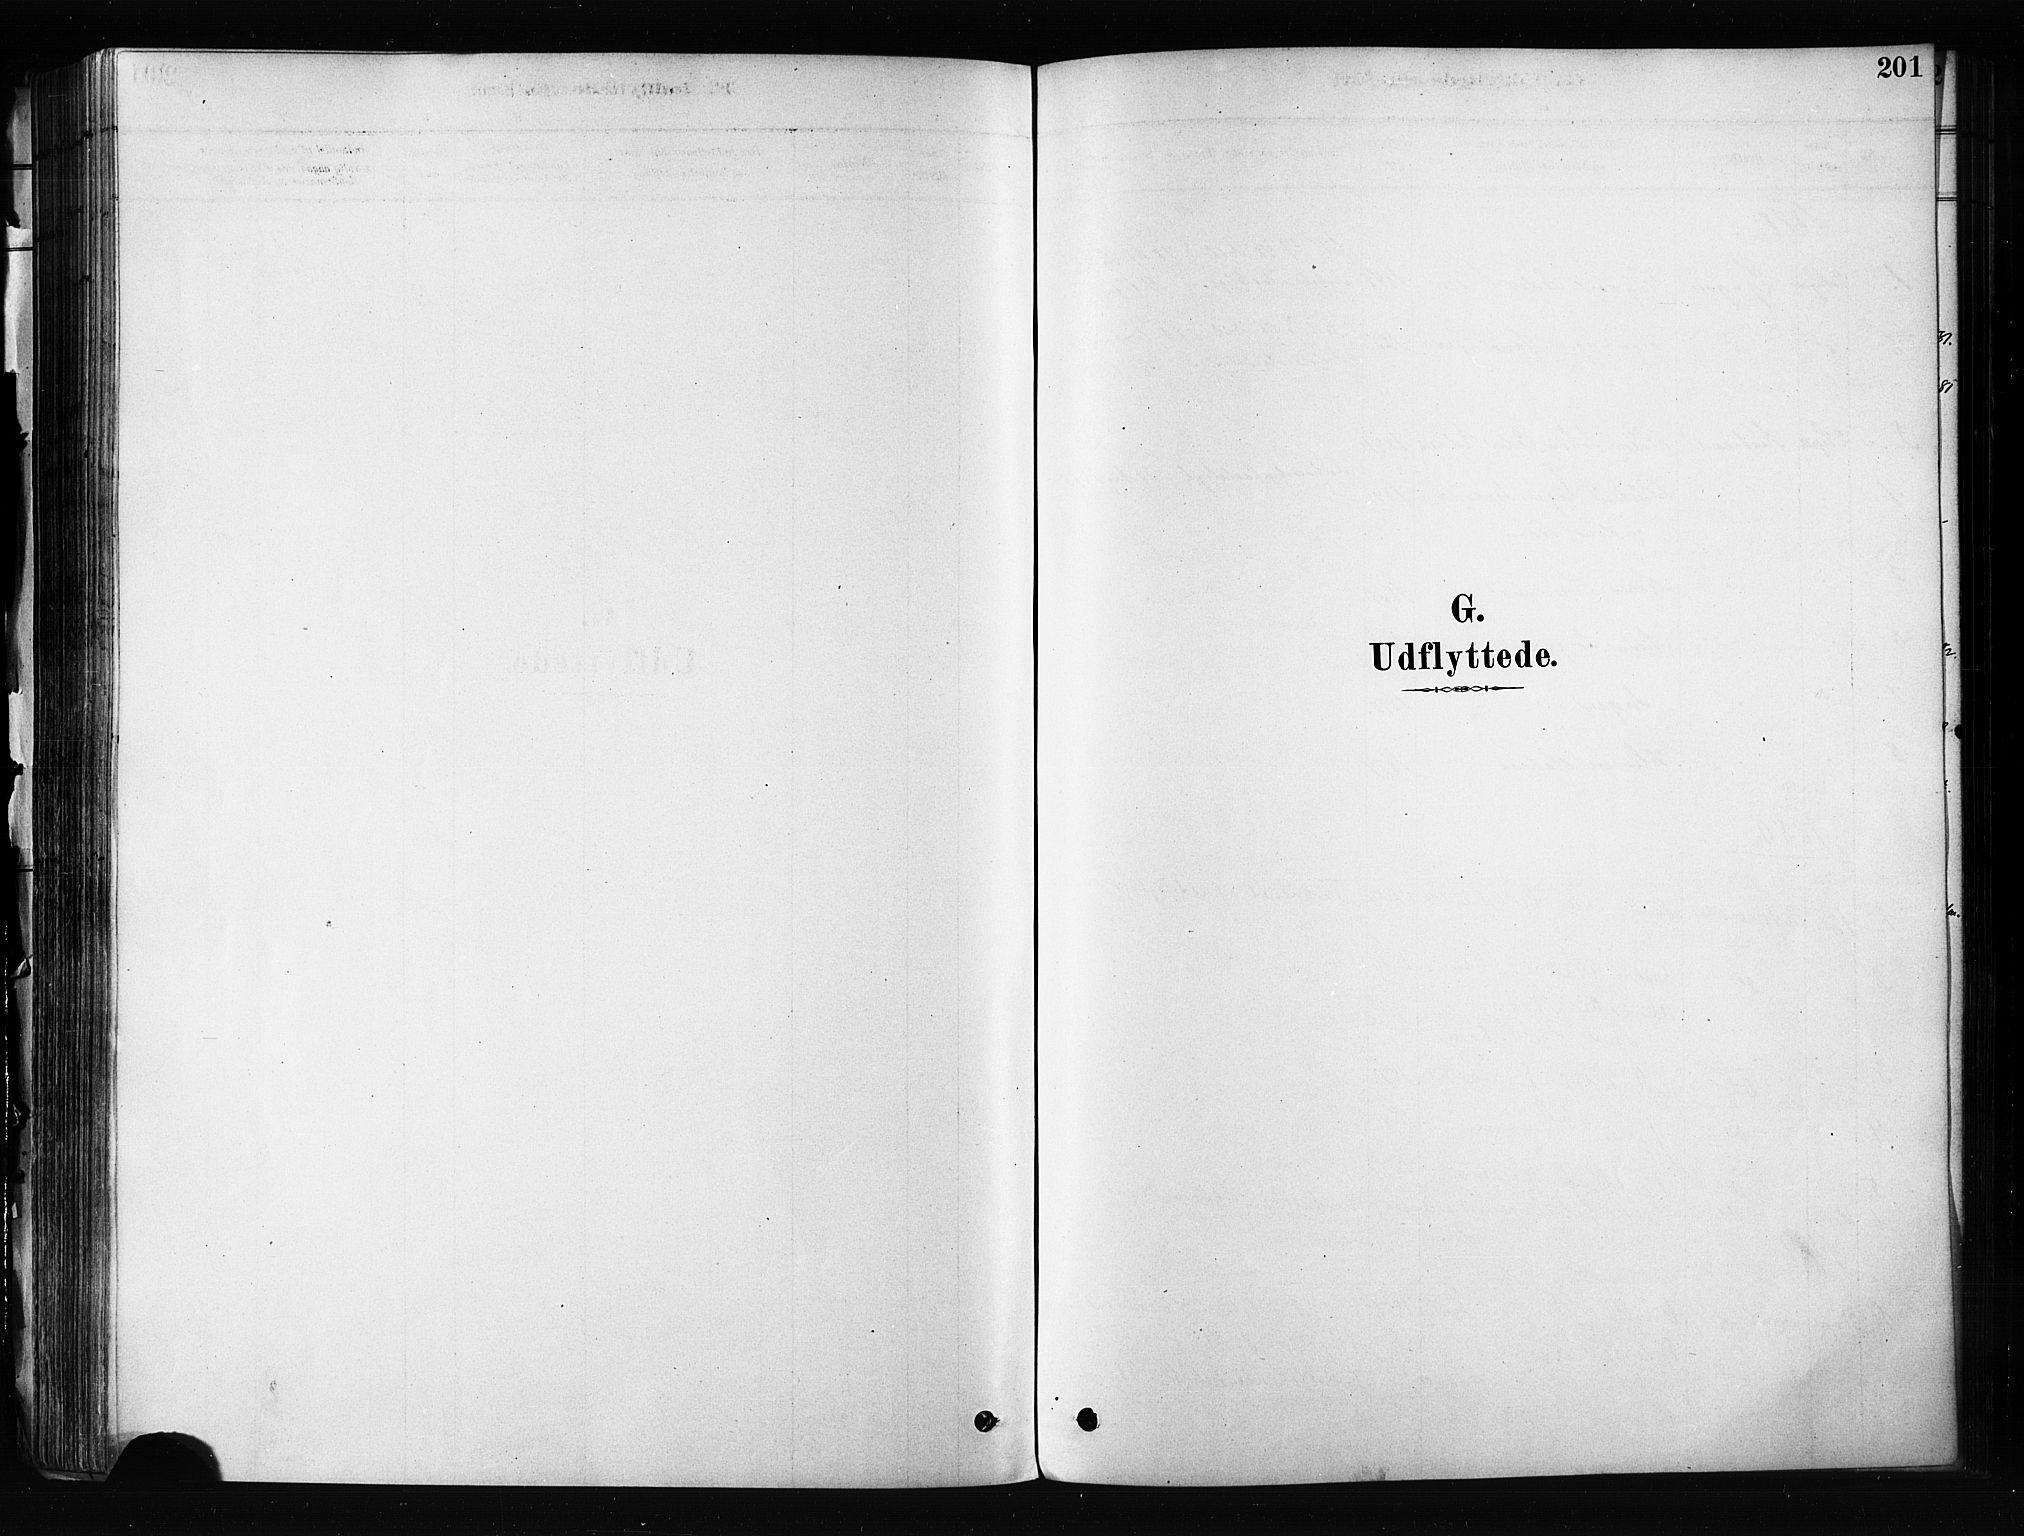 SATØ, Skjervøy sokneprestkontor, H/Ha/Haa/L0012kirke: Ministerialbok nr. 12, 1878-1891, s. 201